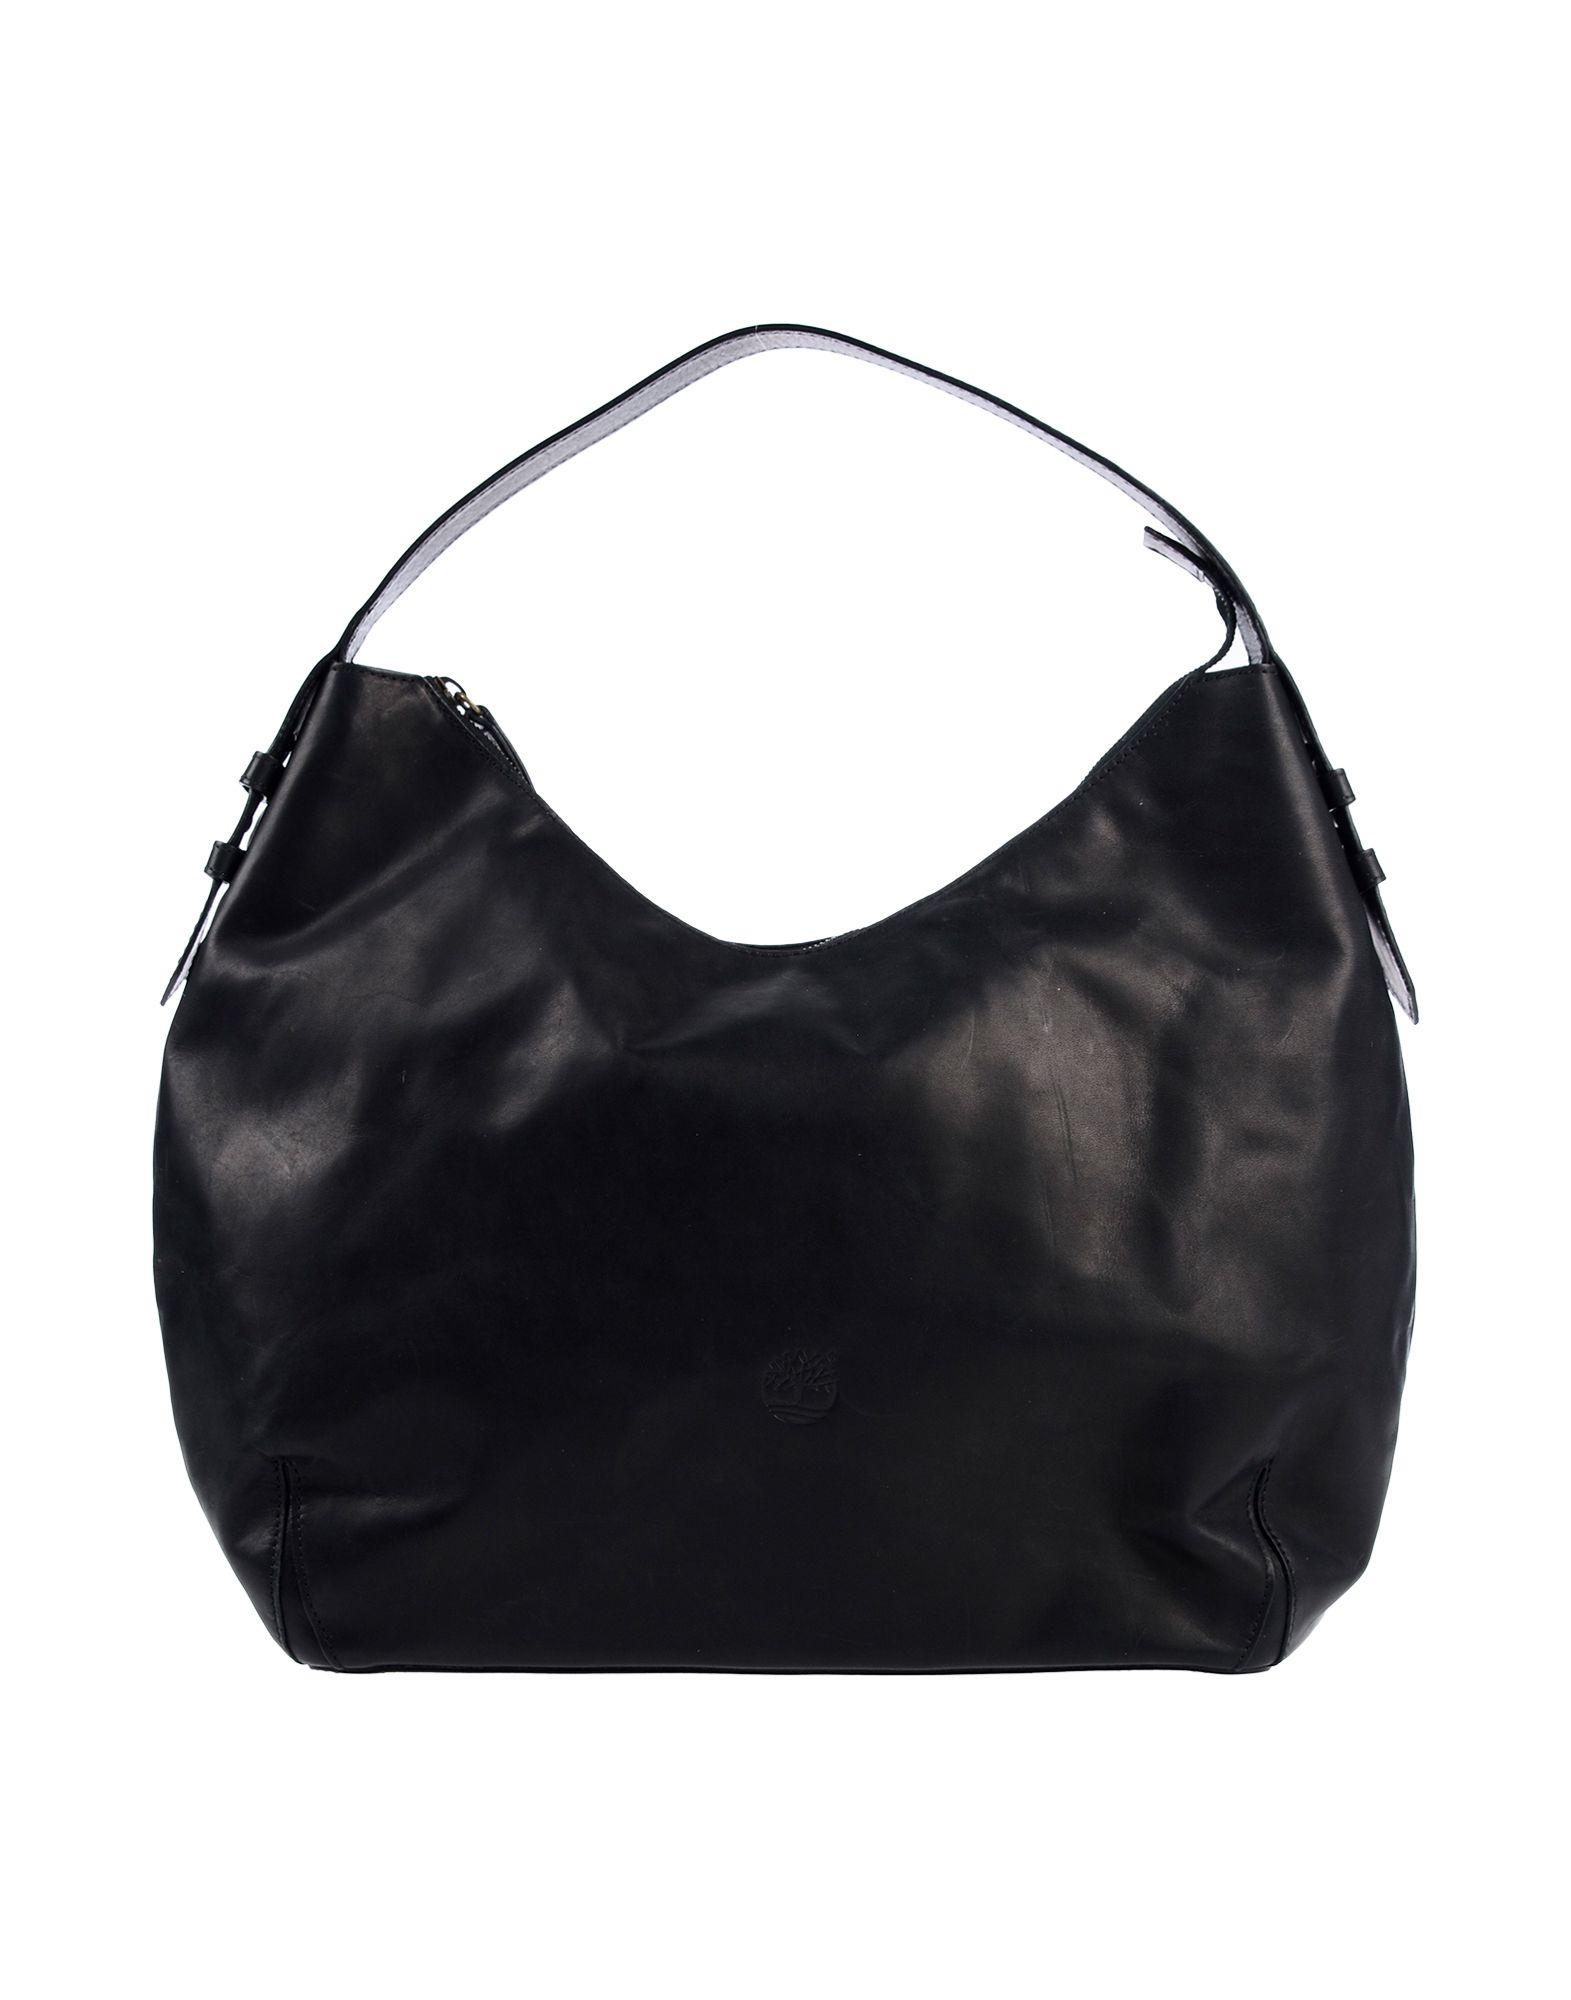 Timberland - Bags - Handbags - On Yoox.com